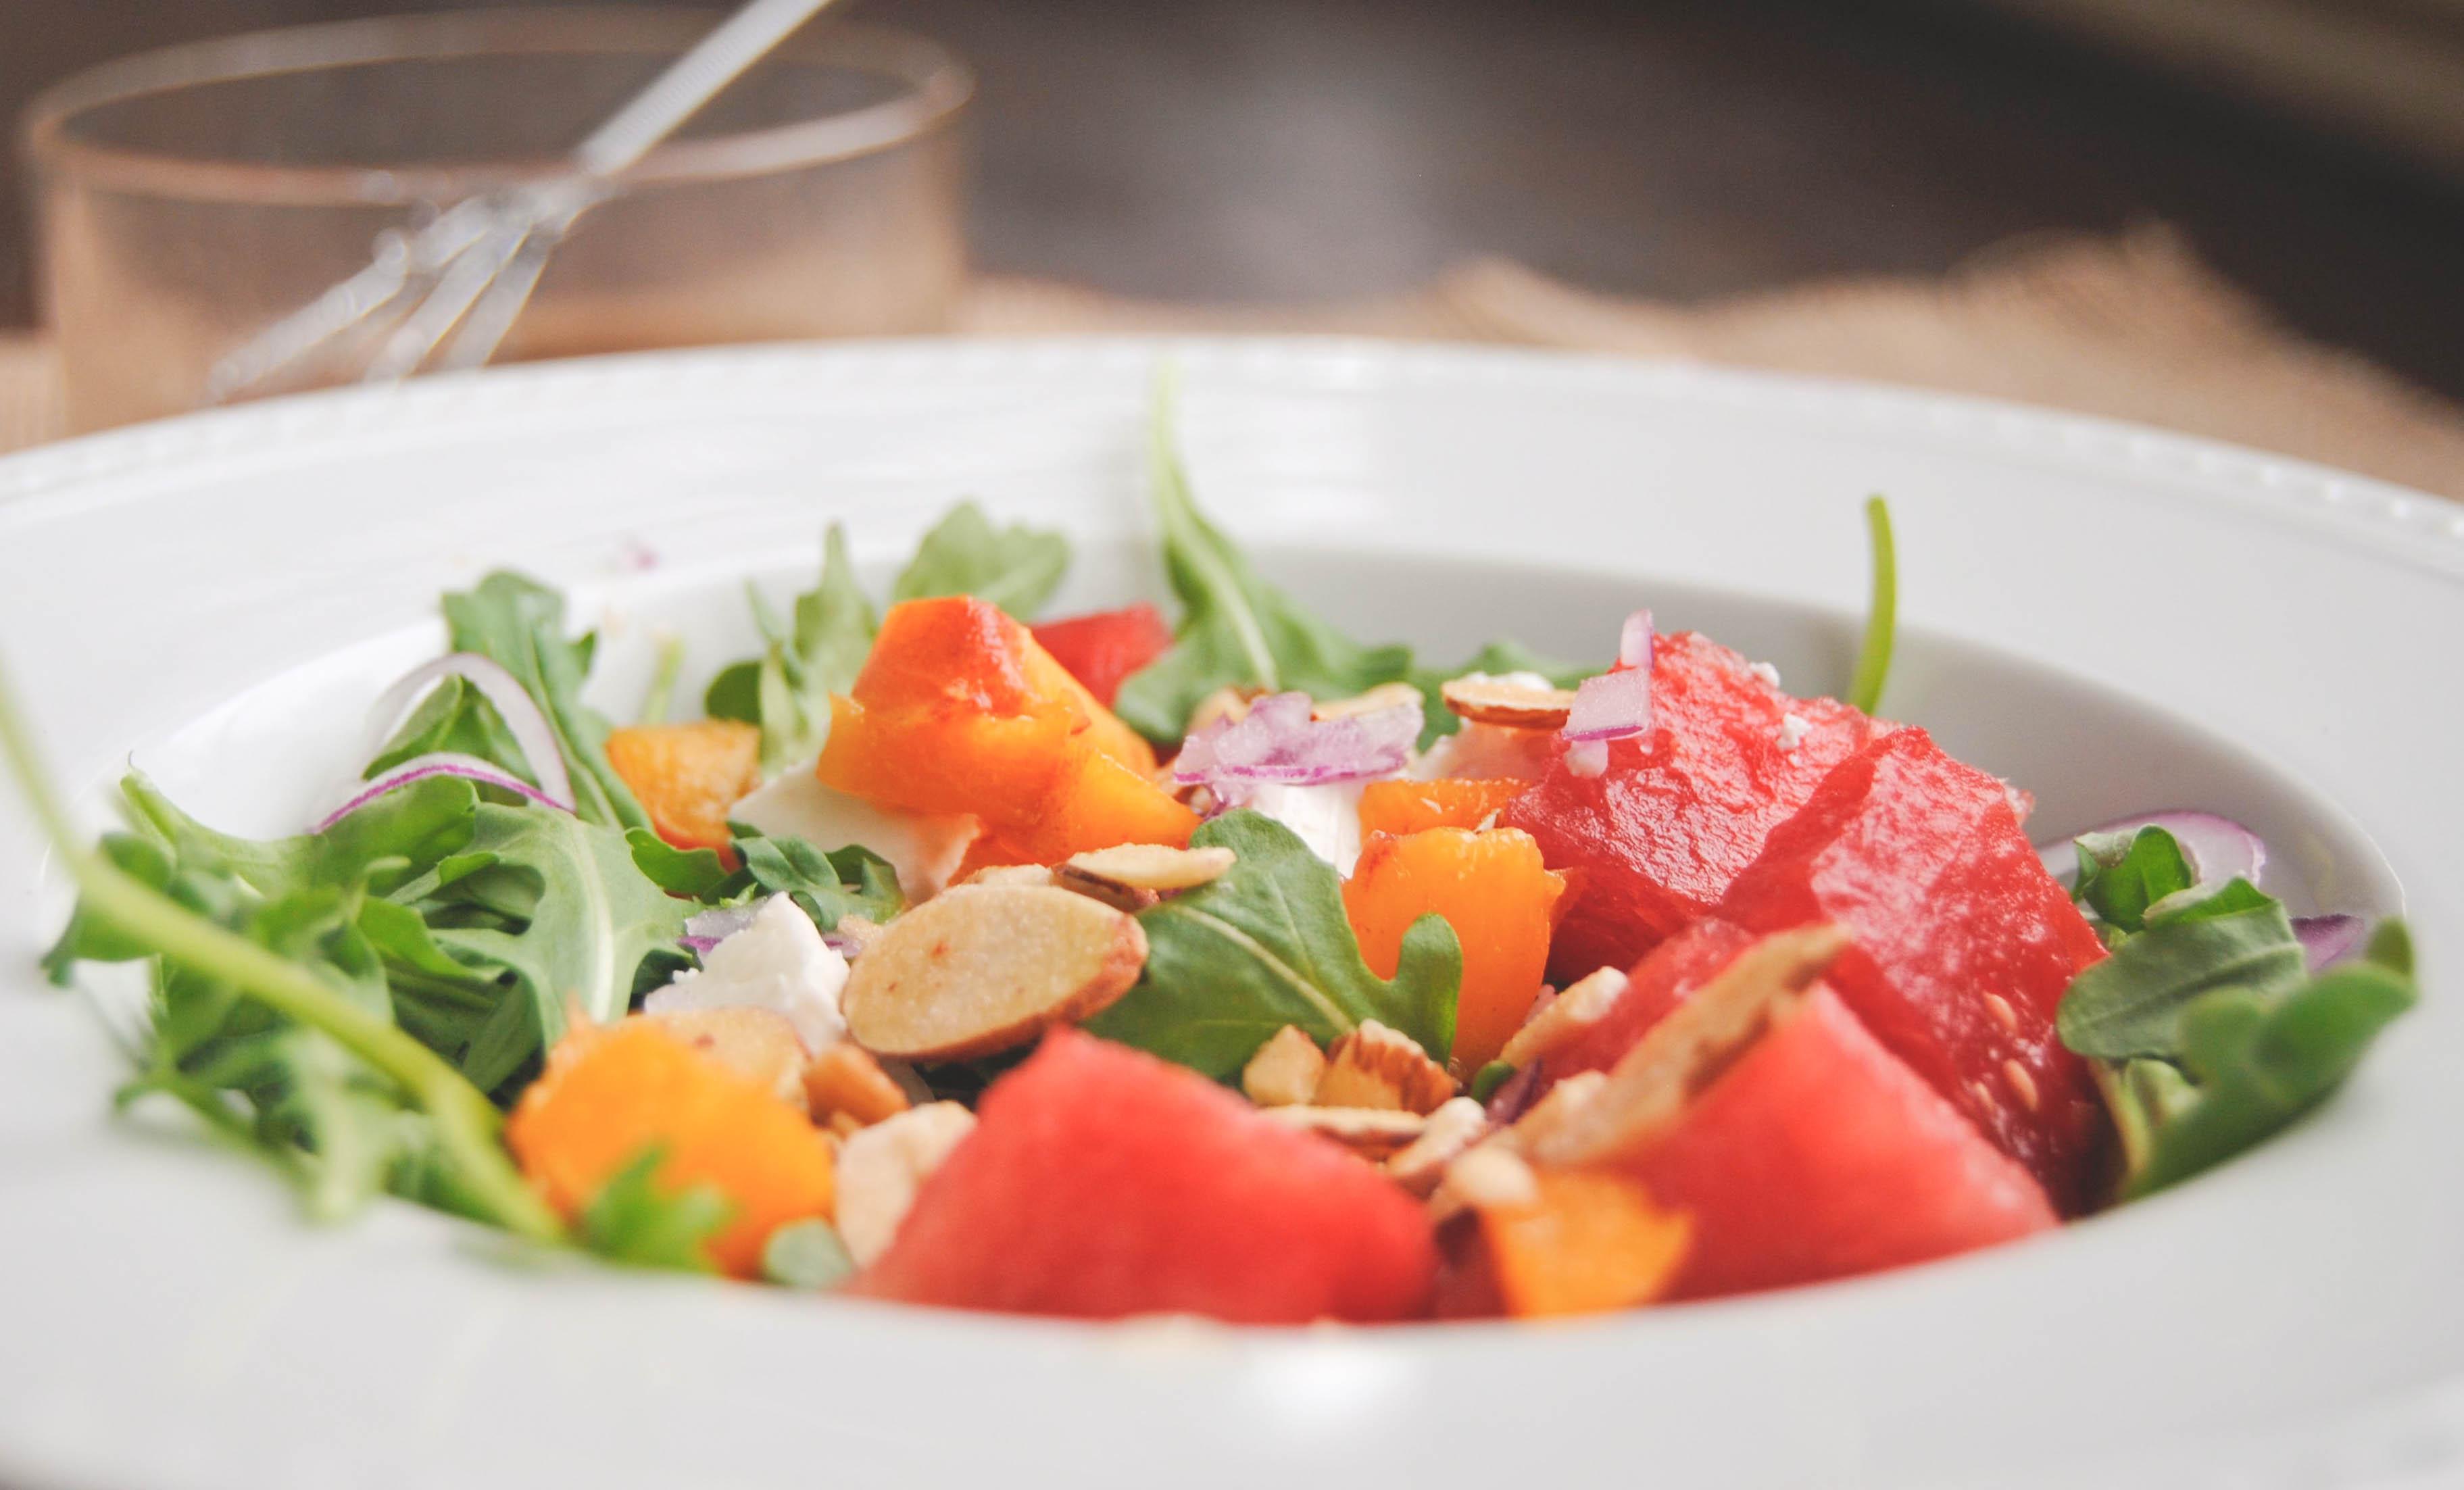 watermelon feta salad with lemon blackberry dressing europe photos my jerusalem kitchen. Black Bedroom Furniture Sets. Home Design Ideas